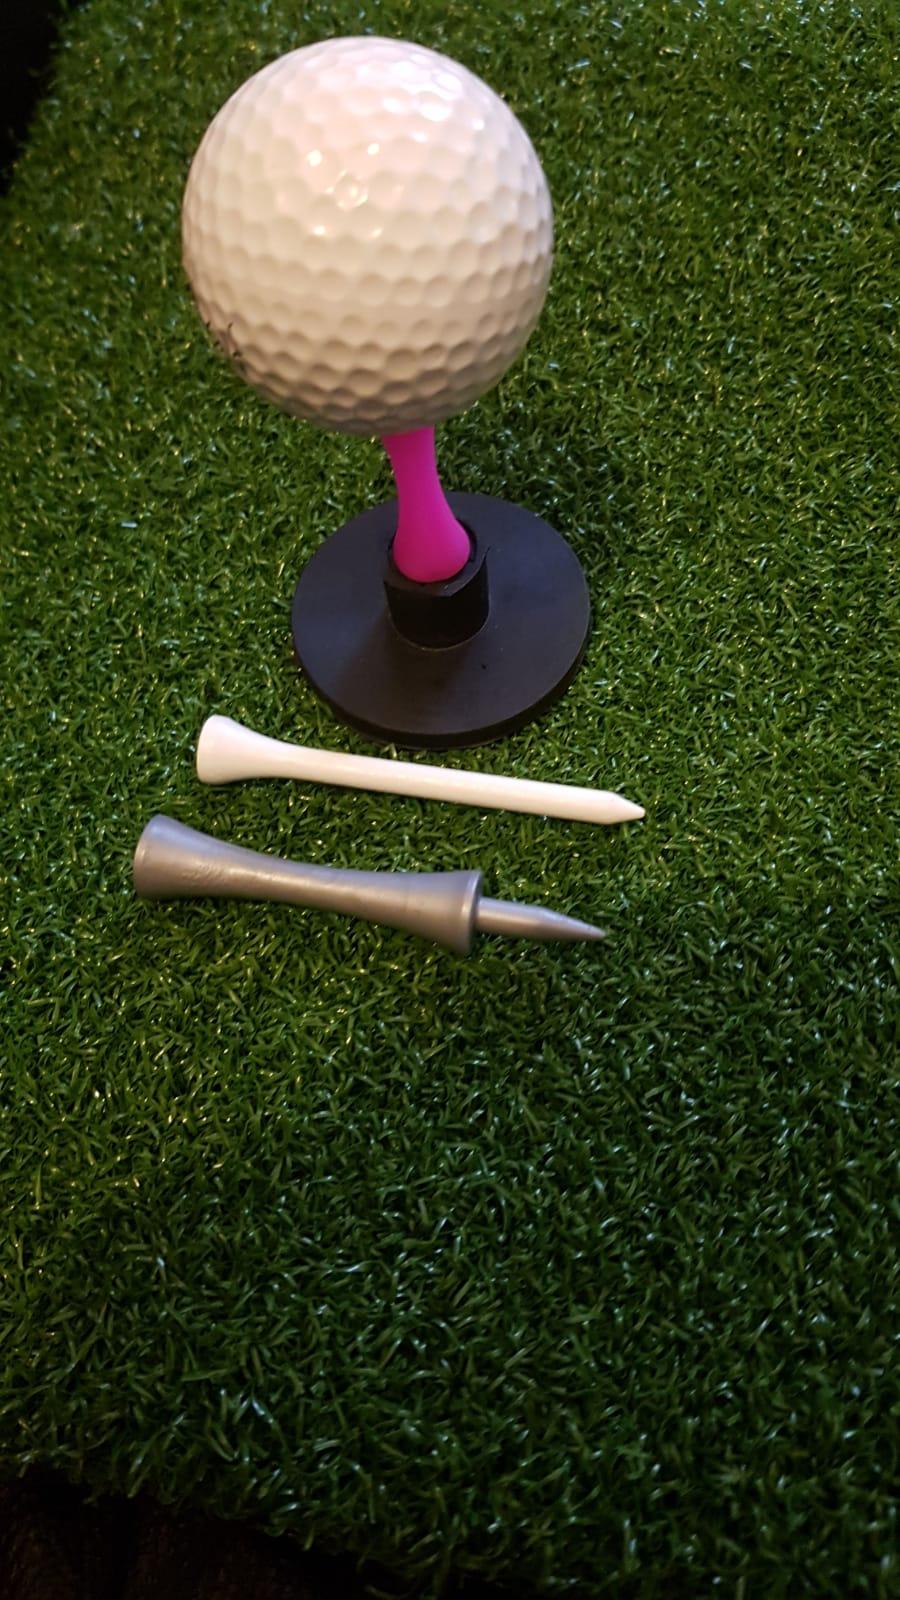 Golf Tee Holder